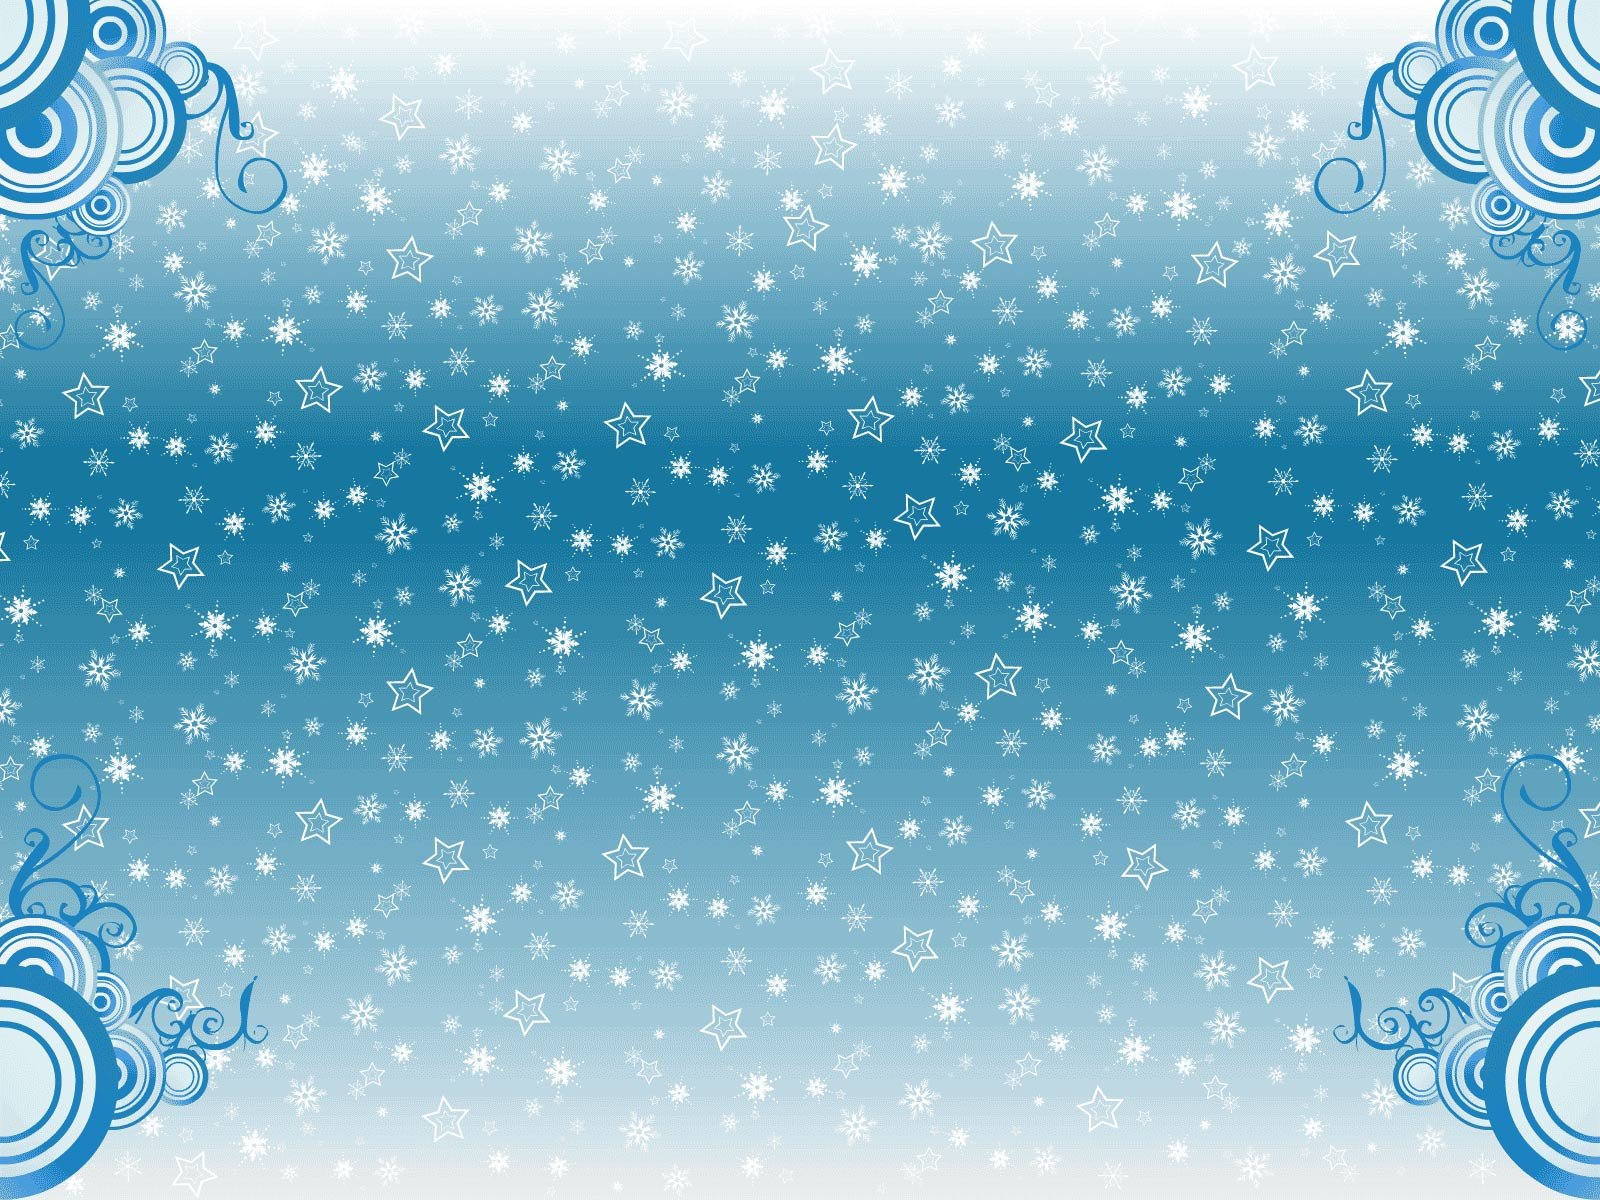 картинки зима фон для презентации море